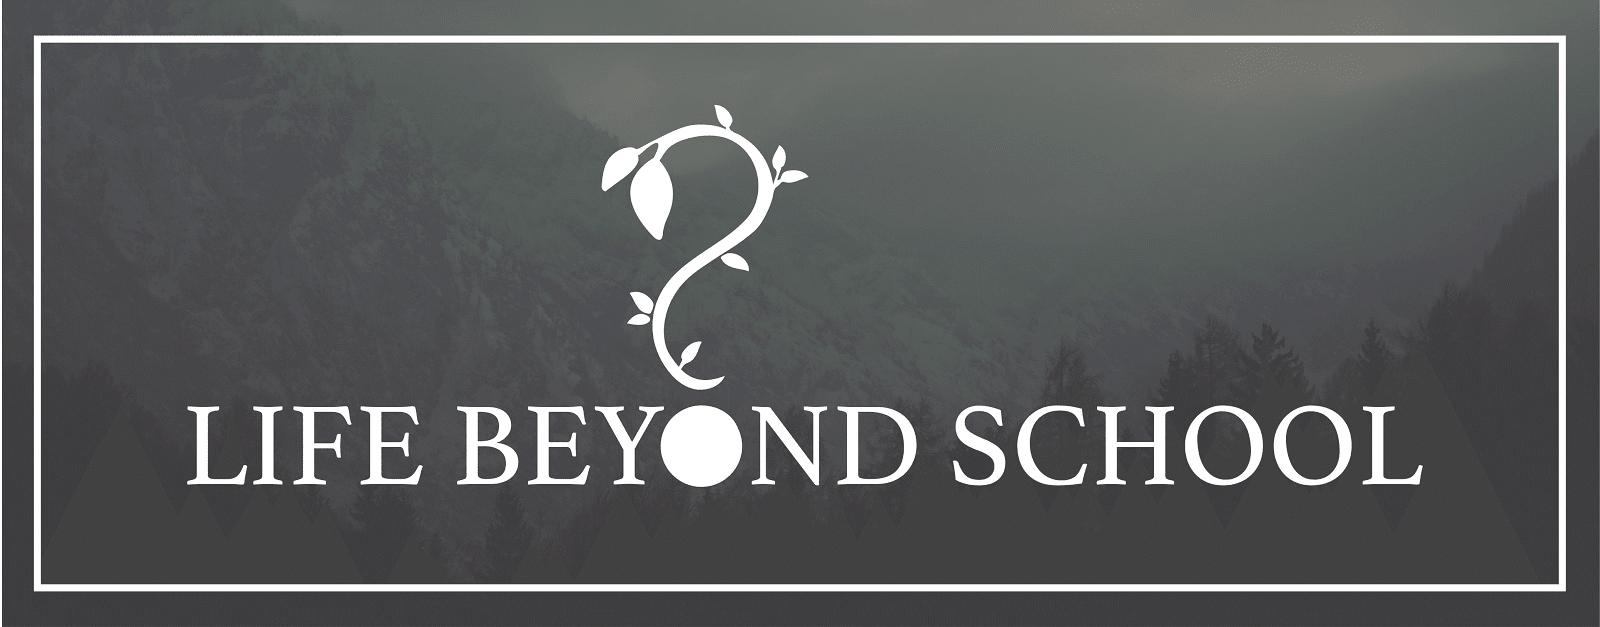 Life Beyond School